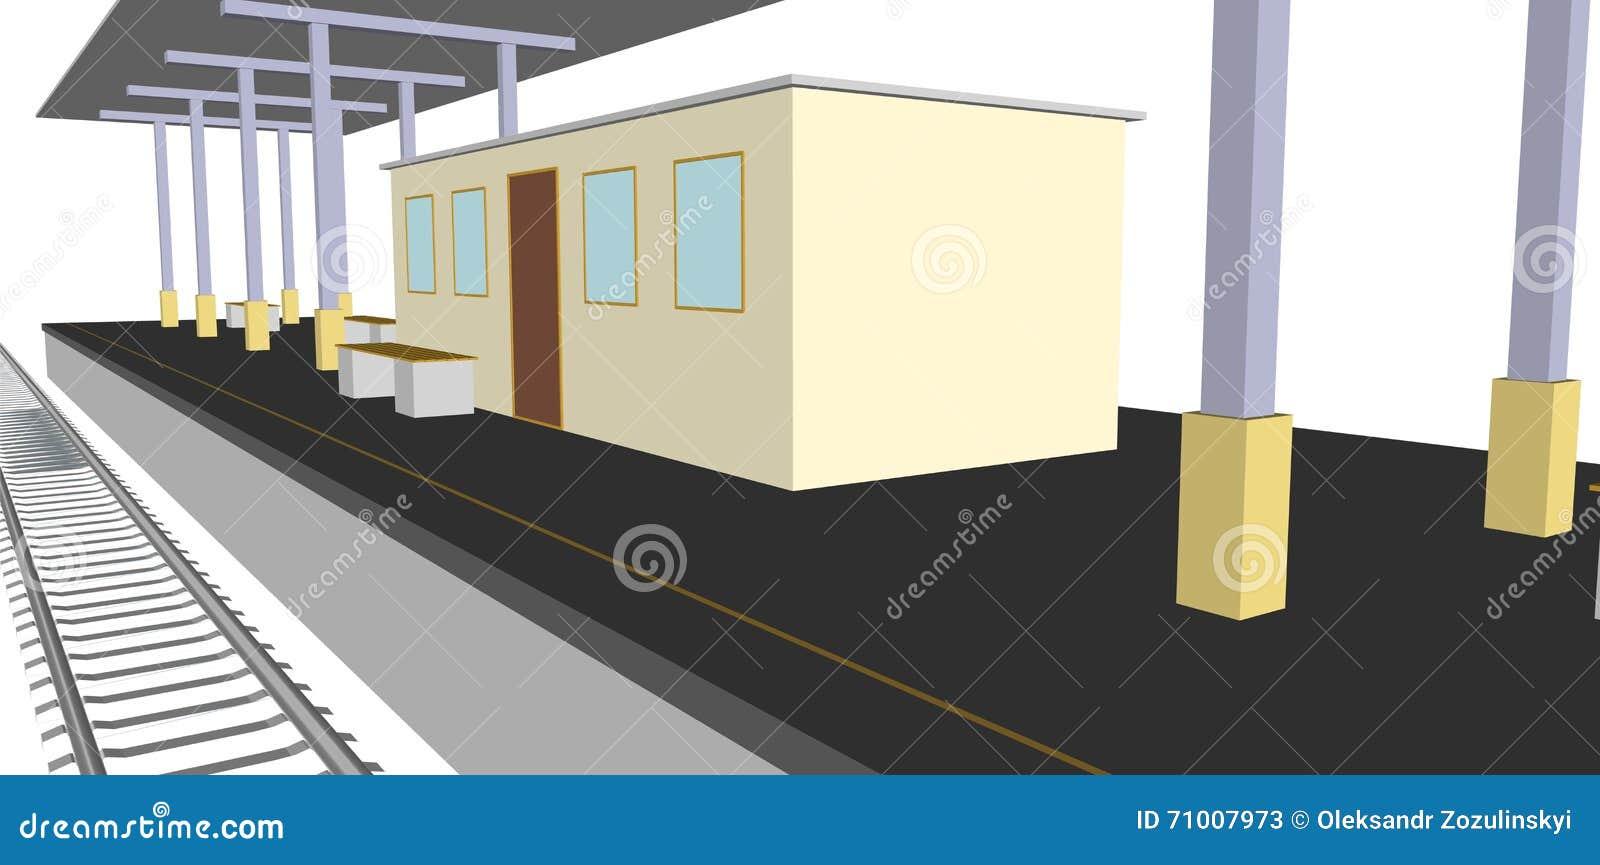 train platform clipart - photo #30